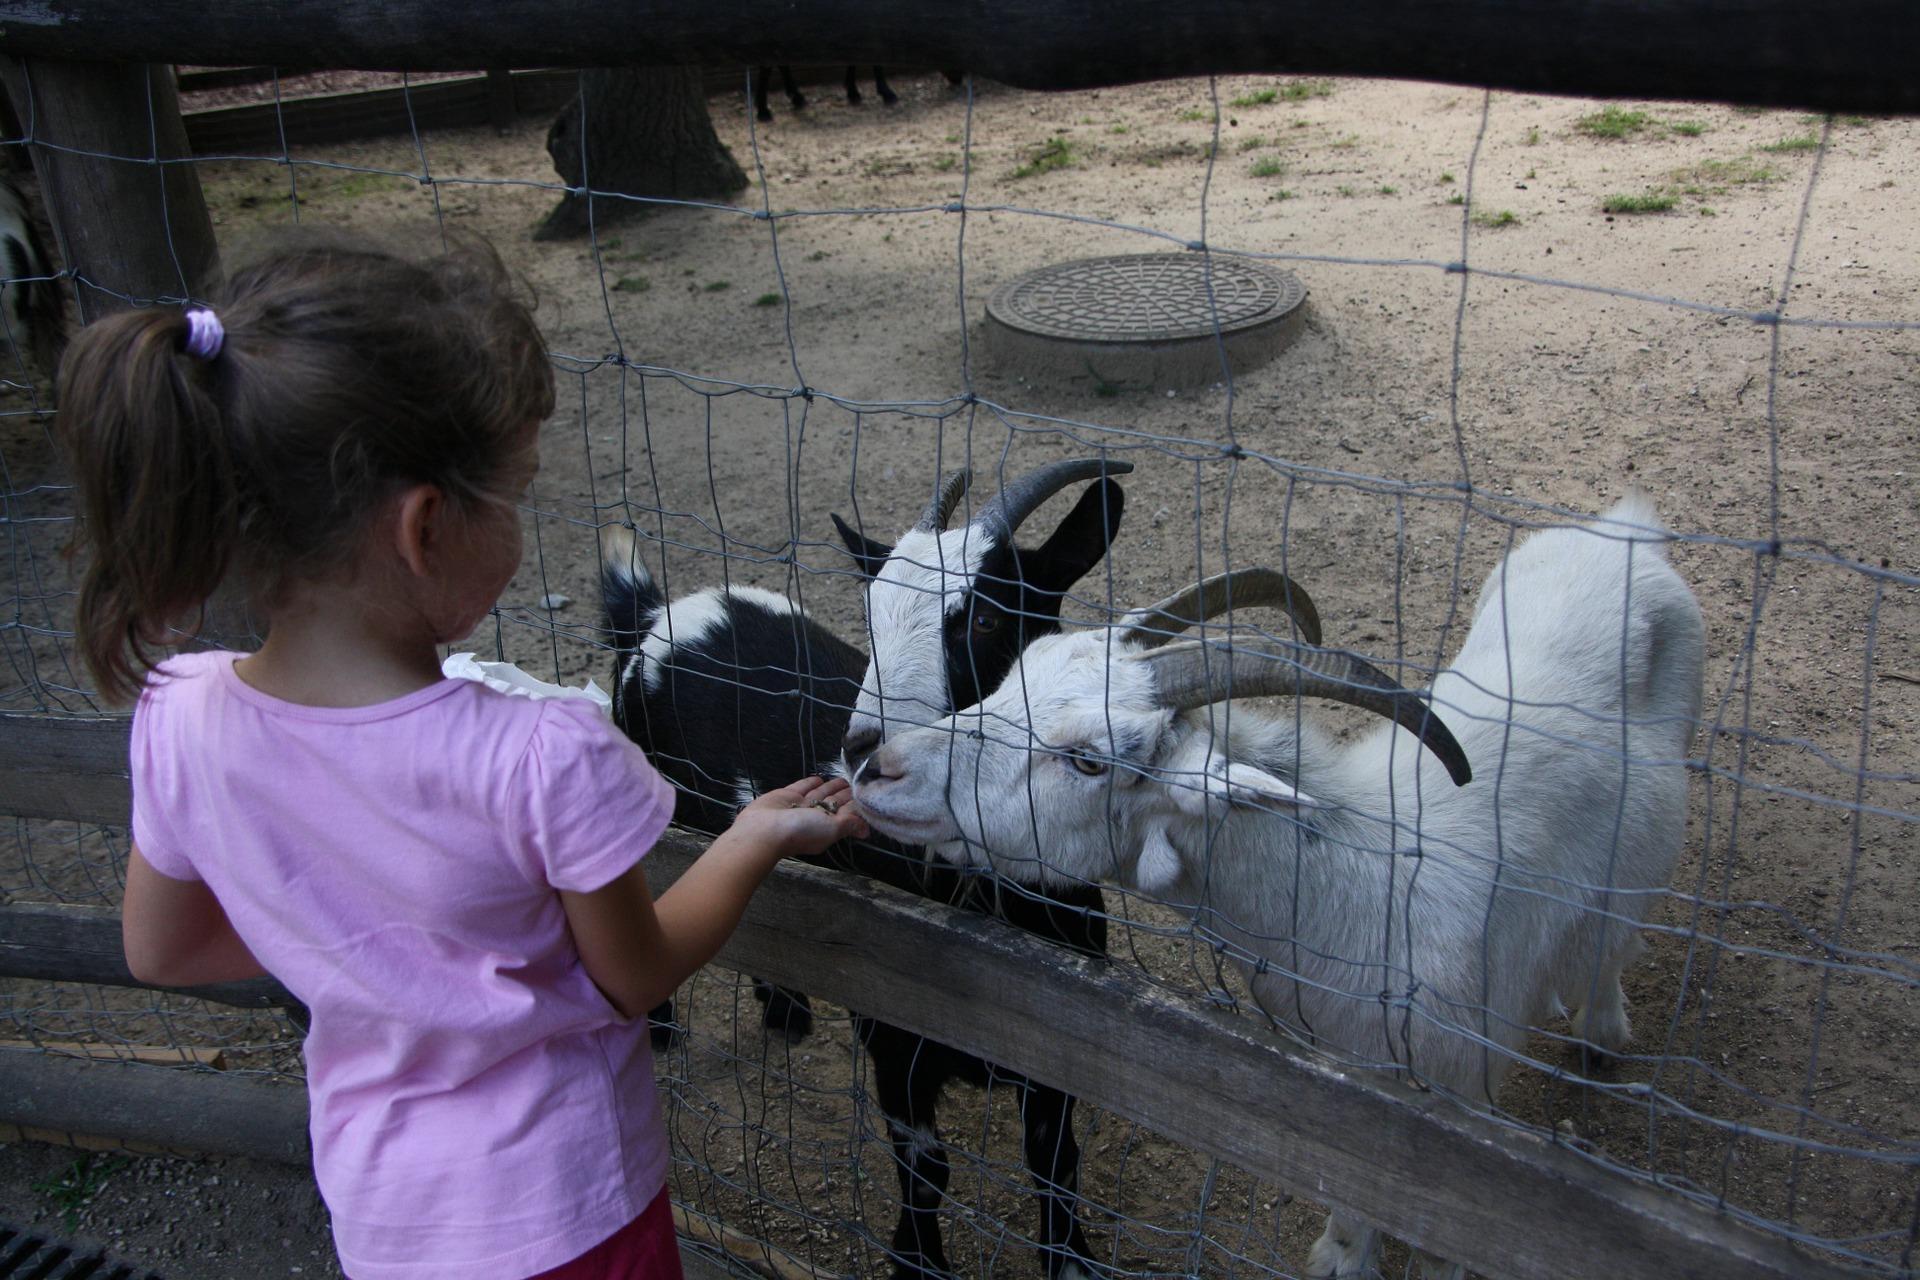 http://www.kleinerkinderpalast.de/wp-content/uploads/2016/10/goats-1241832_1920.jpg